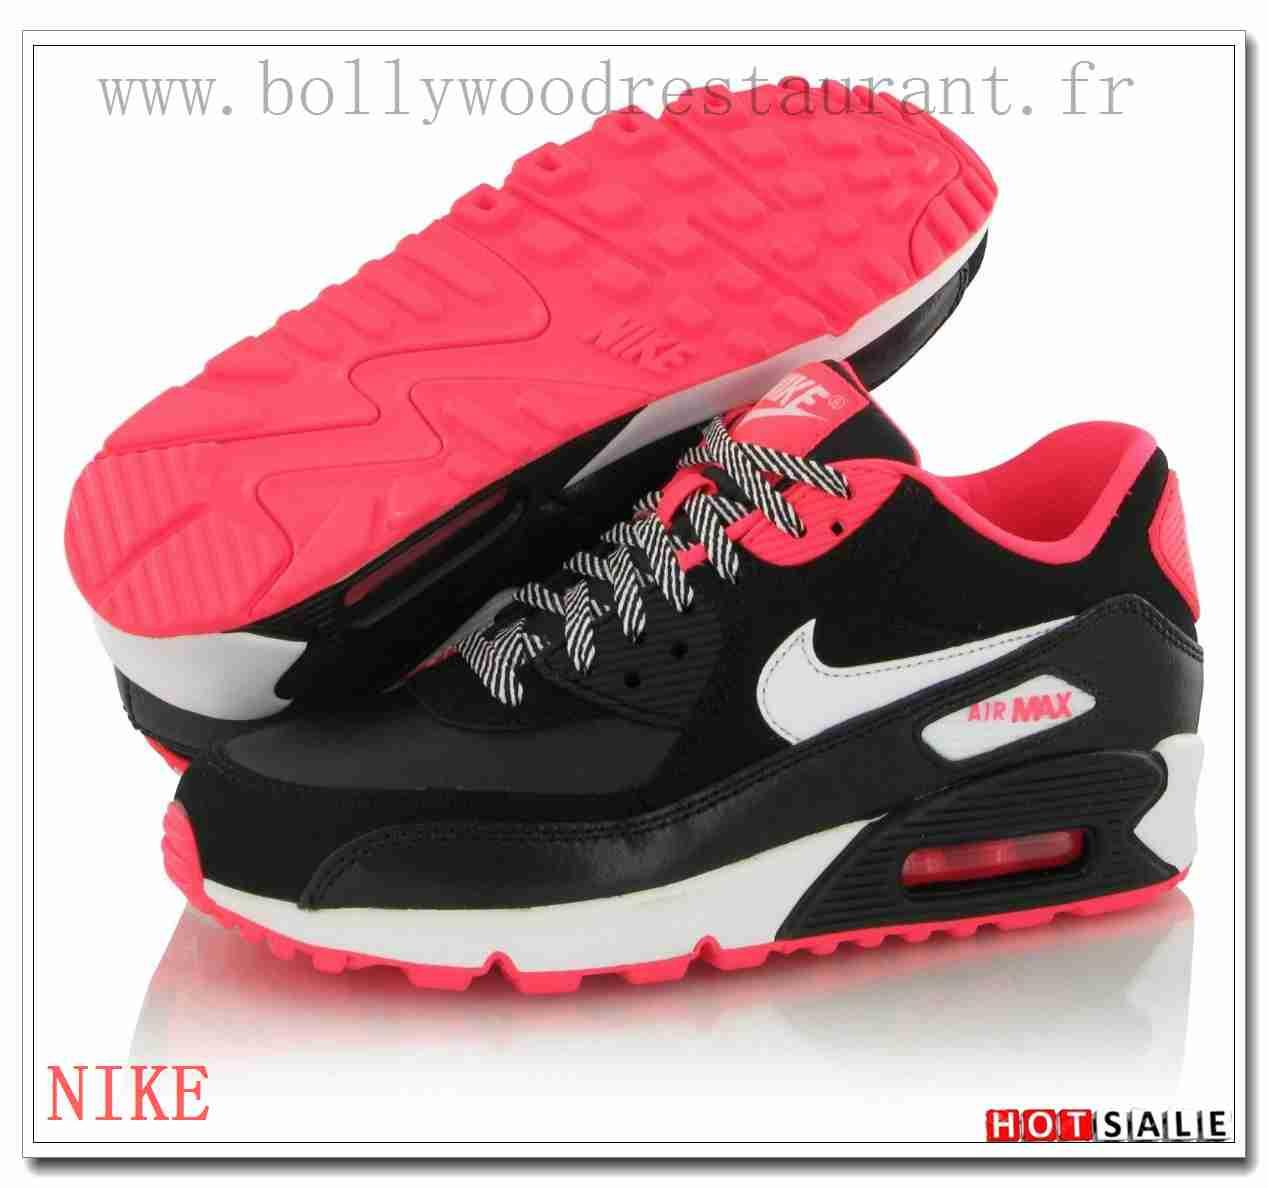 best service 627bc ed7a5 VE3598 Meilleur Prix 2018 Nouveau style Nike Air Max 90 - Femme Chaussures  - Rose Promotions Vente - H.K.Y. 885 - Taille   36~39